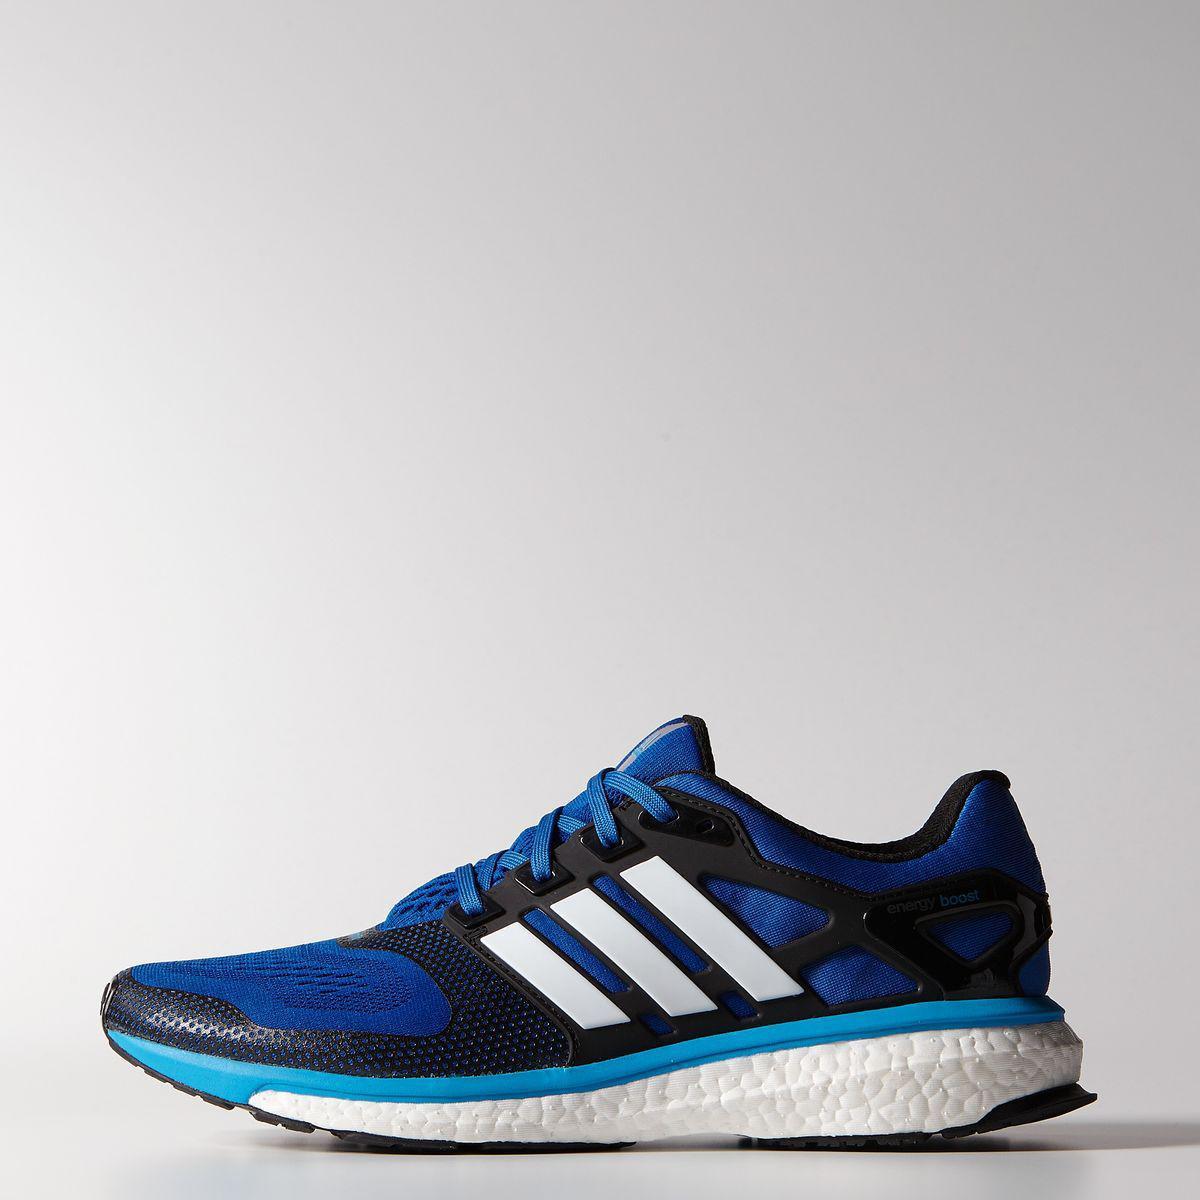 designer fashion bec1c 983c7 Adidas Mens Energy Boost 2.0 ESM Running Shoes - Blue Beauty -  Tennisnuts.com